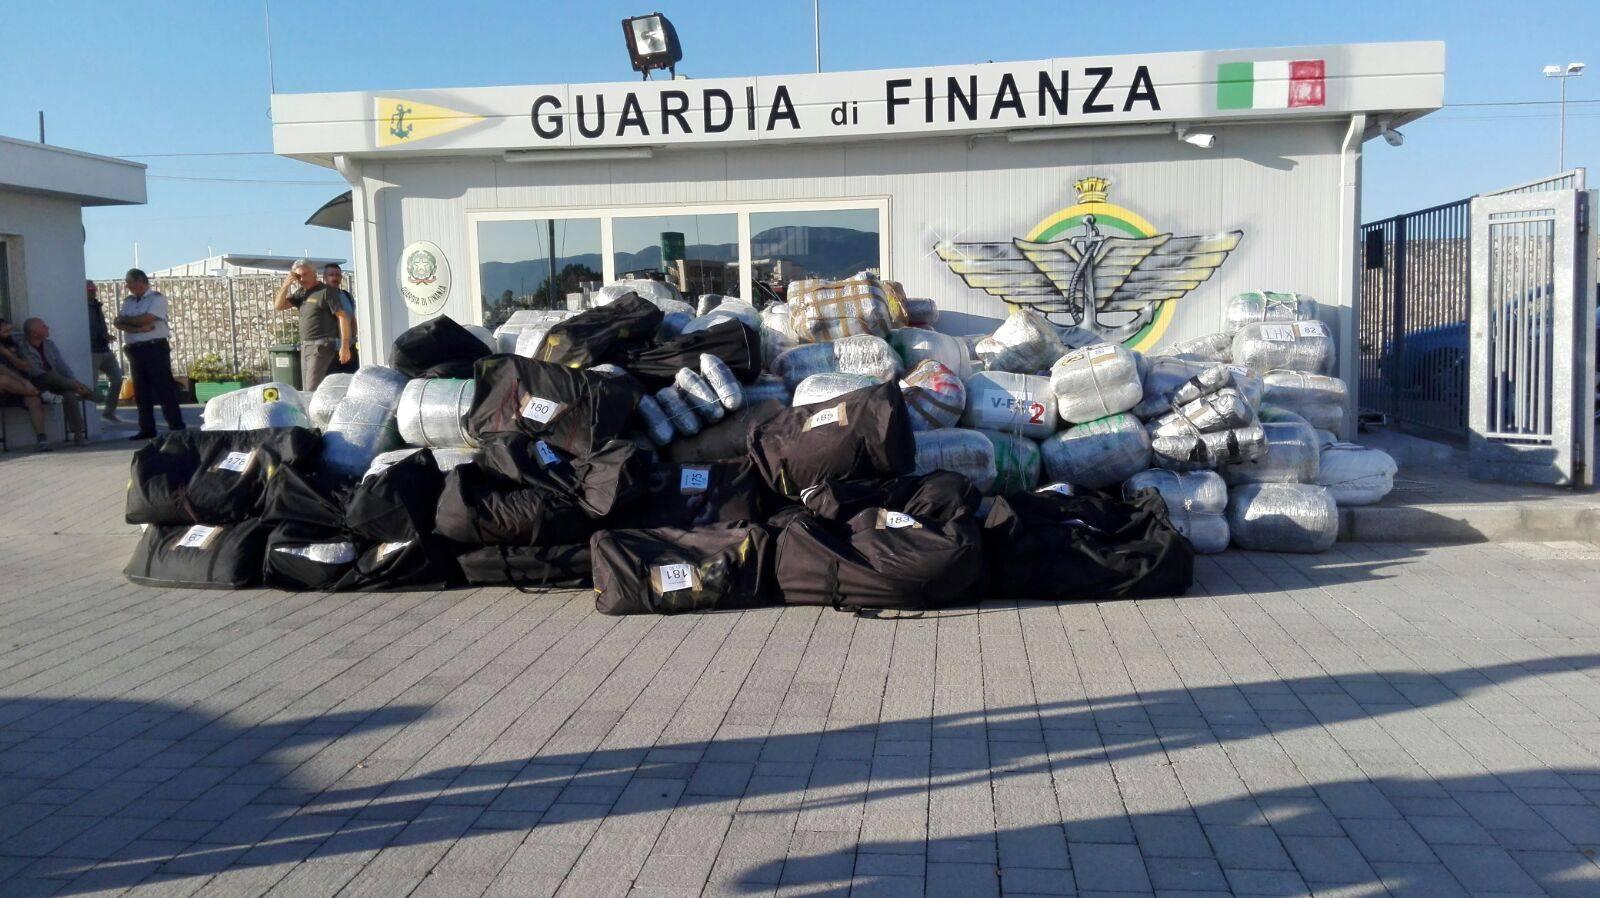 IN DEPTH - Drug Trafficking, Organized Crime, & Corruption: Albania's No. 1 Threat